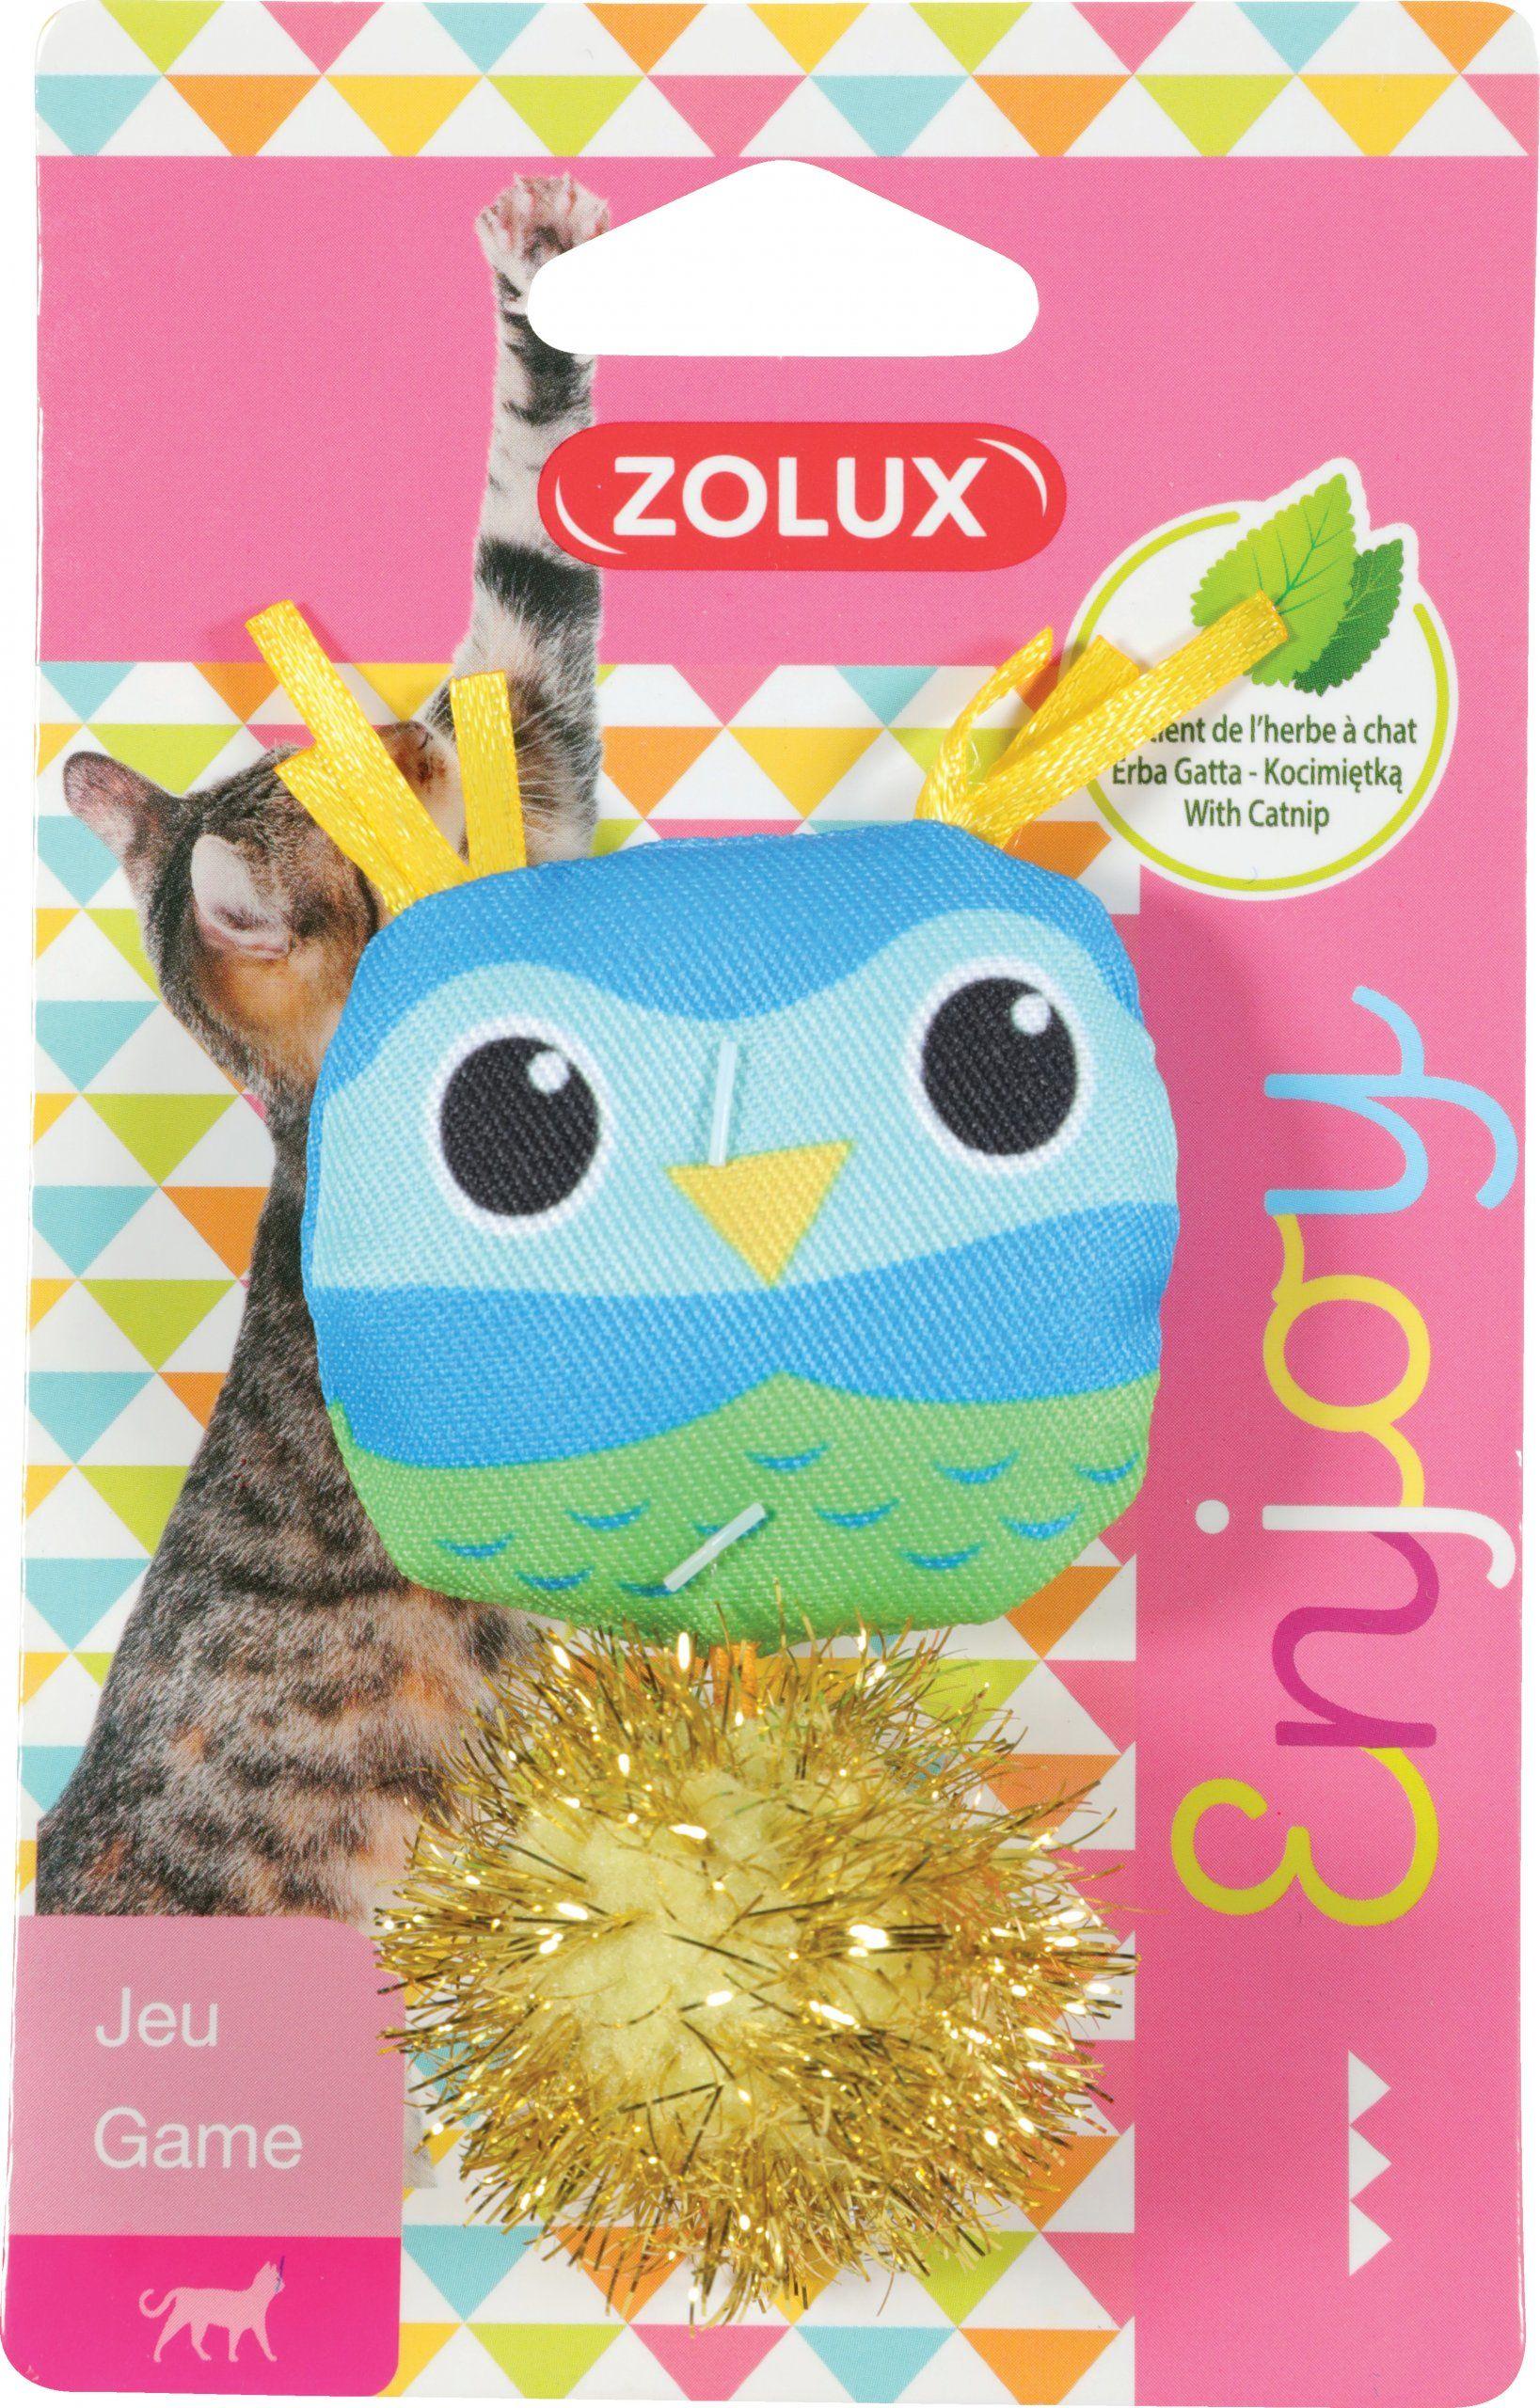 Zolux Zabawka dla kota Lovely sowa